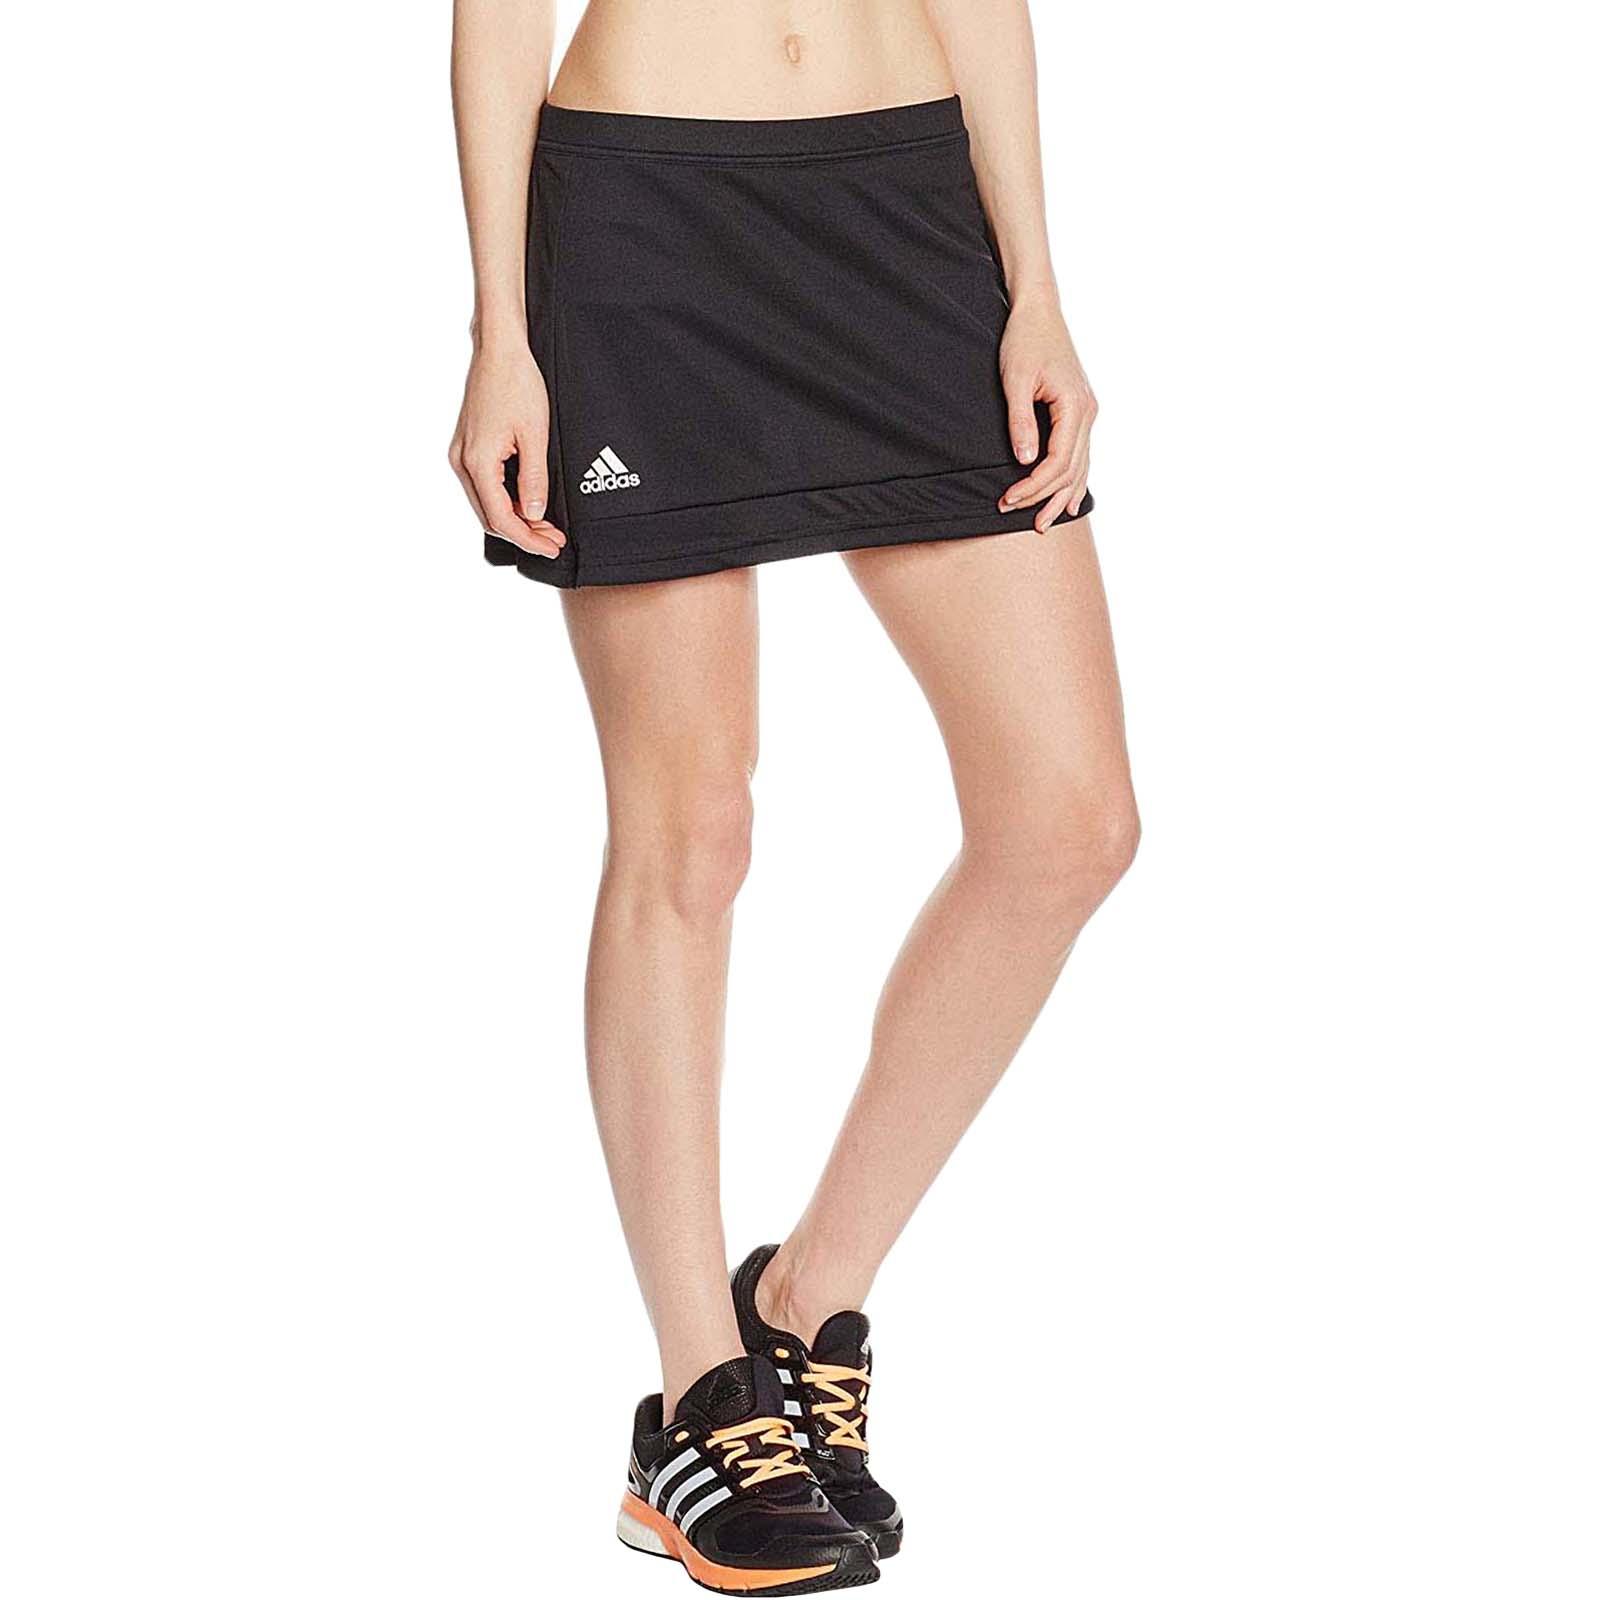 adidas teamwear tennis